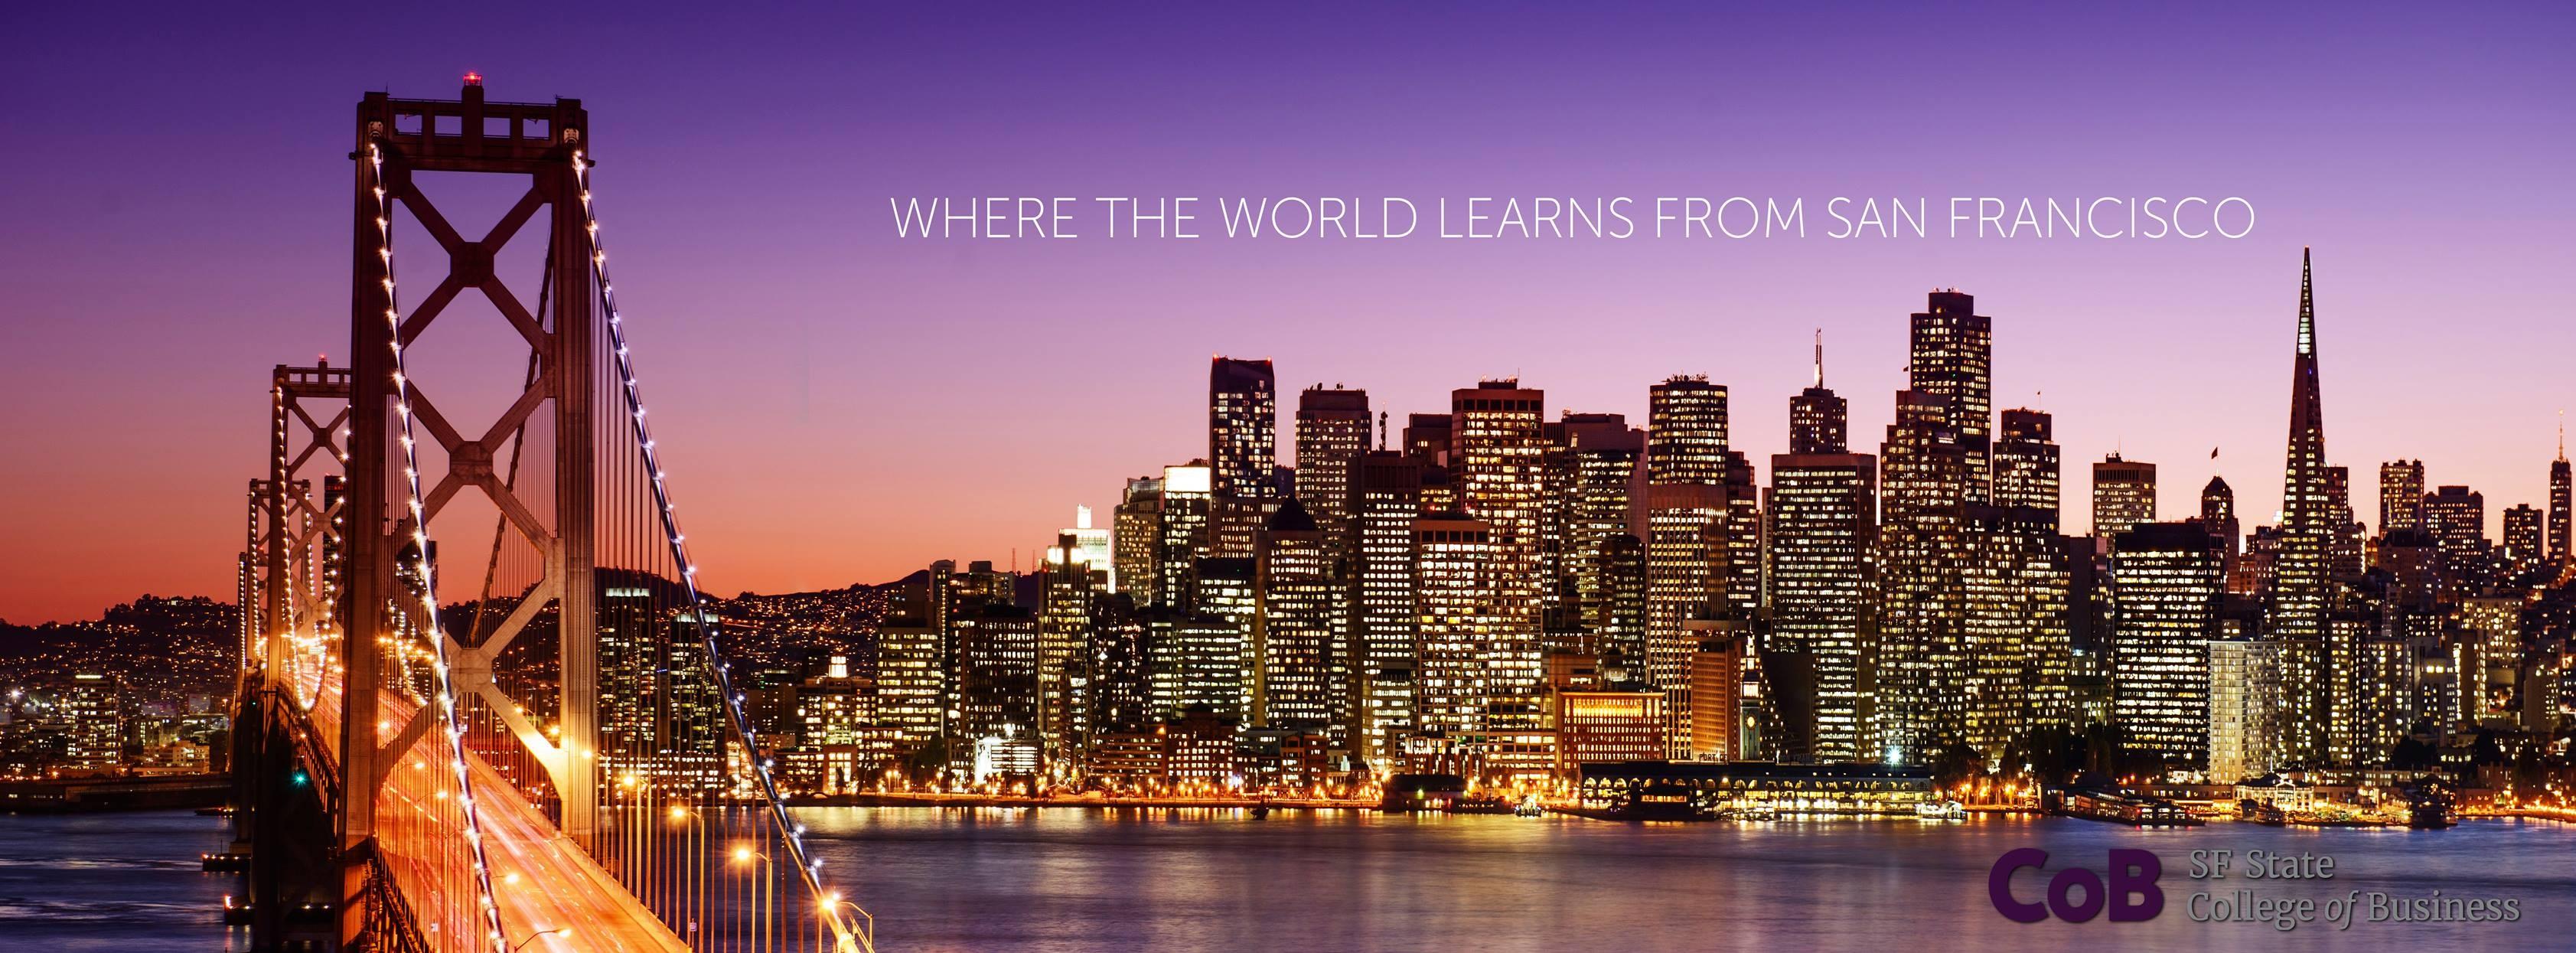 San Francisco State University, College of Business | LinkedIn